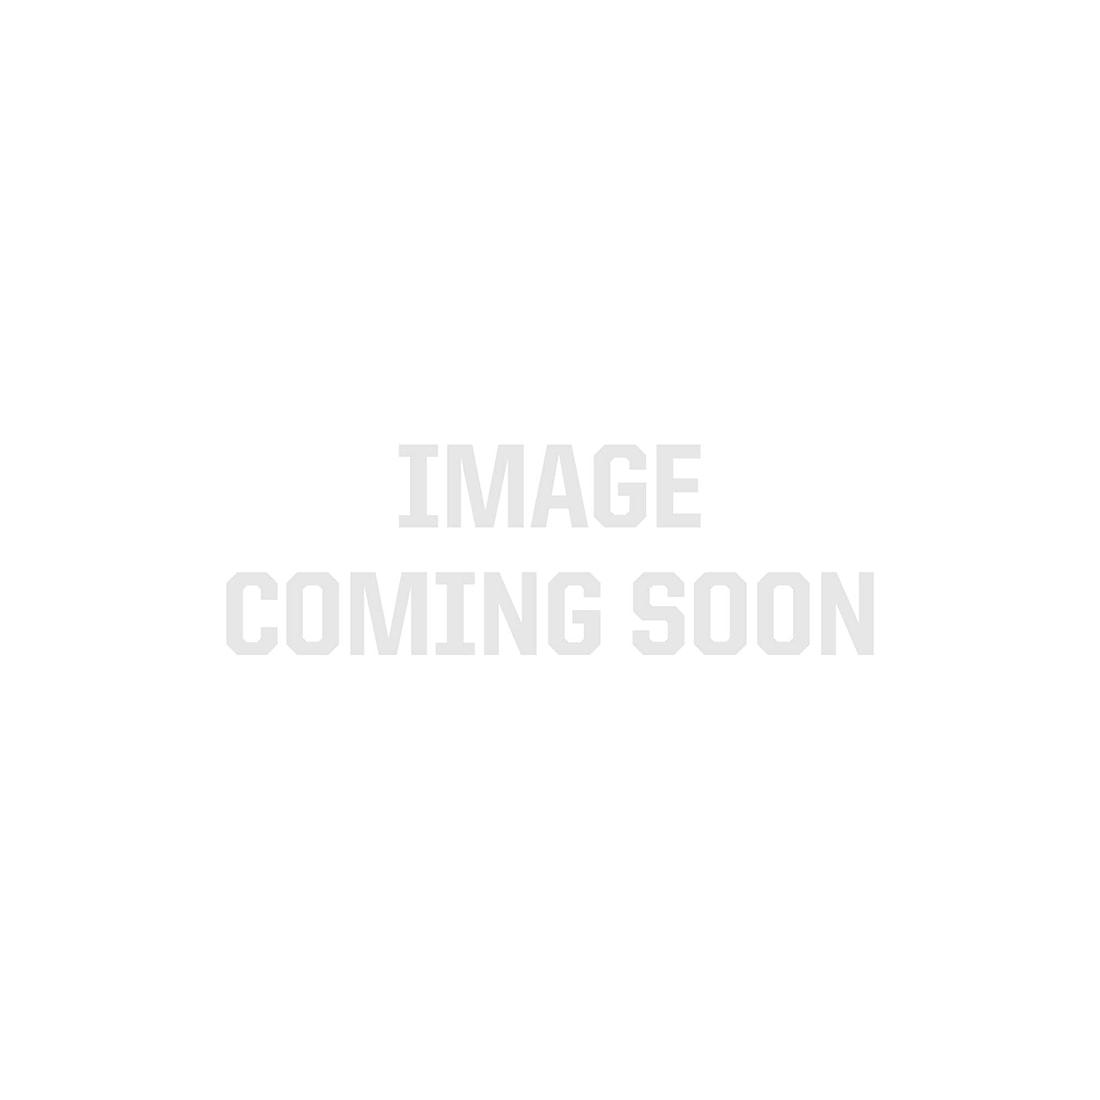 TruColor 2835 LED Strip Light - 2,700K - 160/m - CurrentControl - Sample Kit